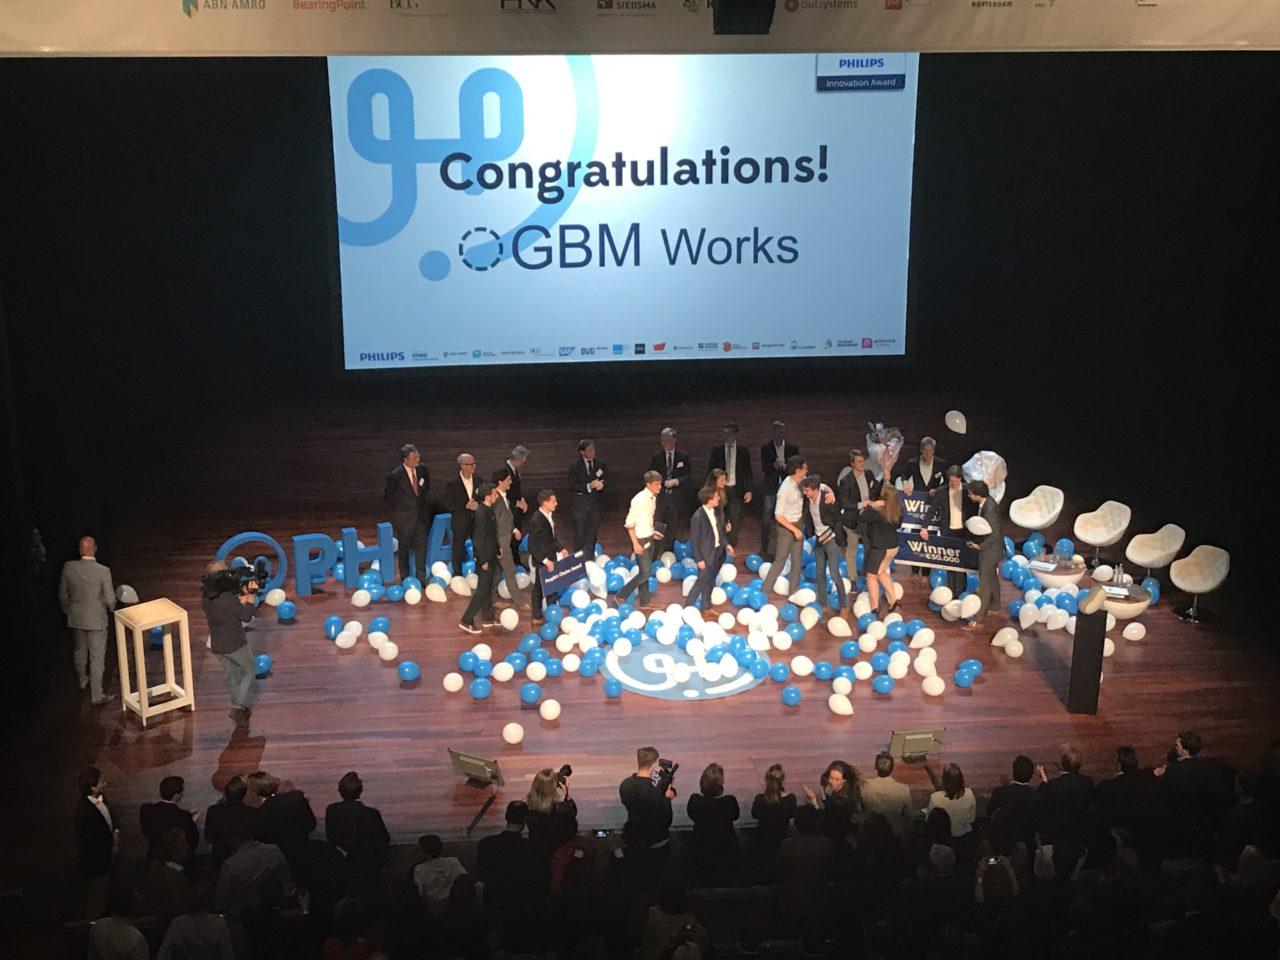 GBM works Philips Innovation Award 2017